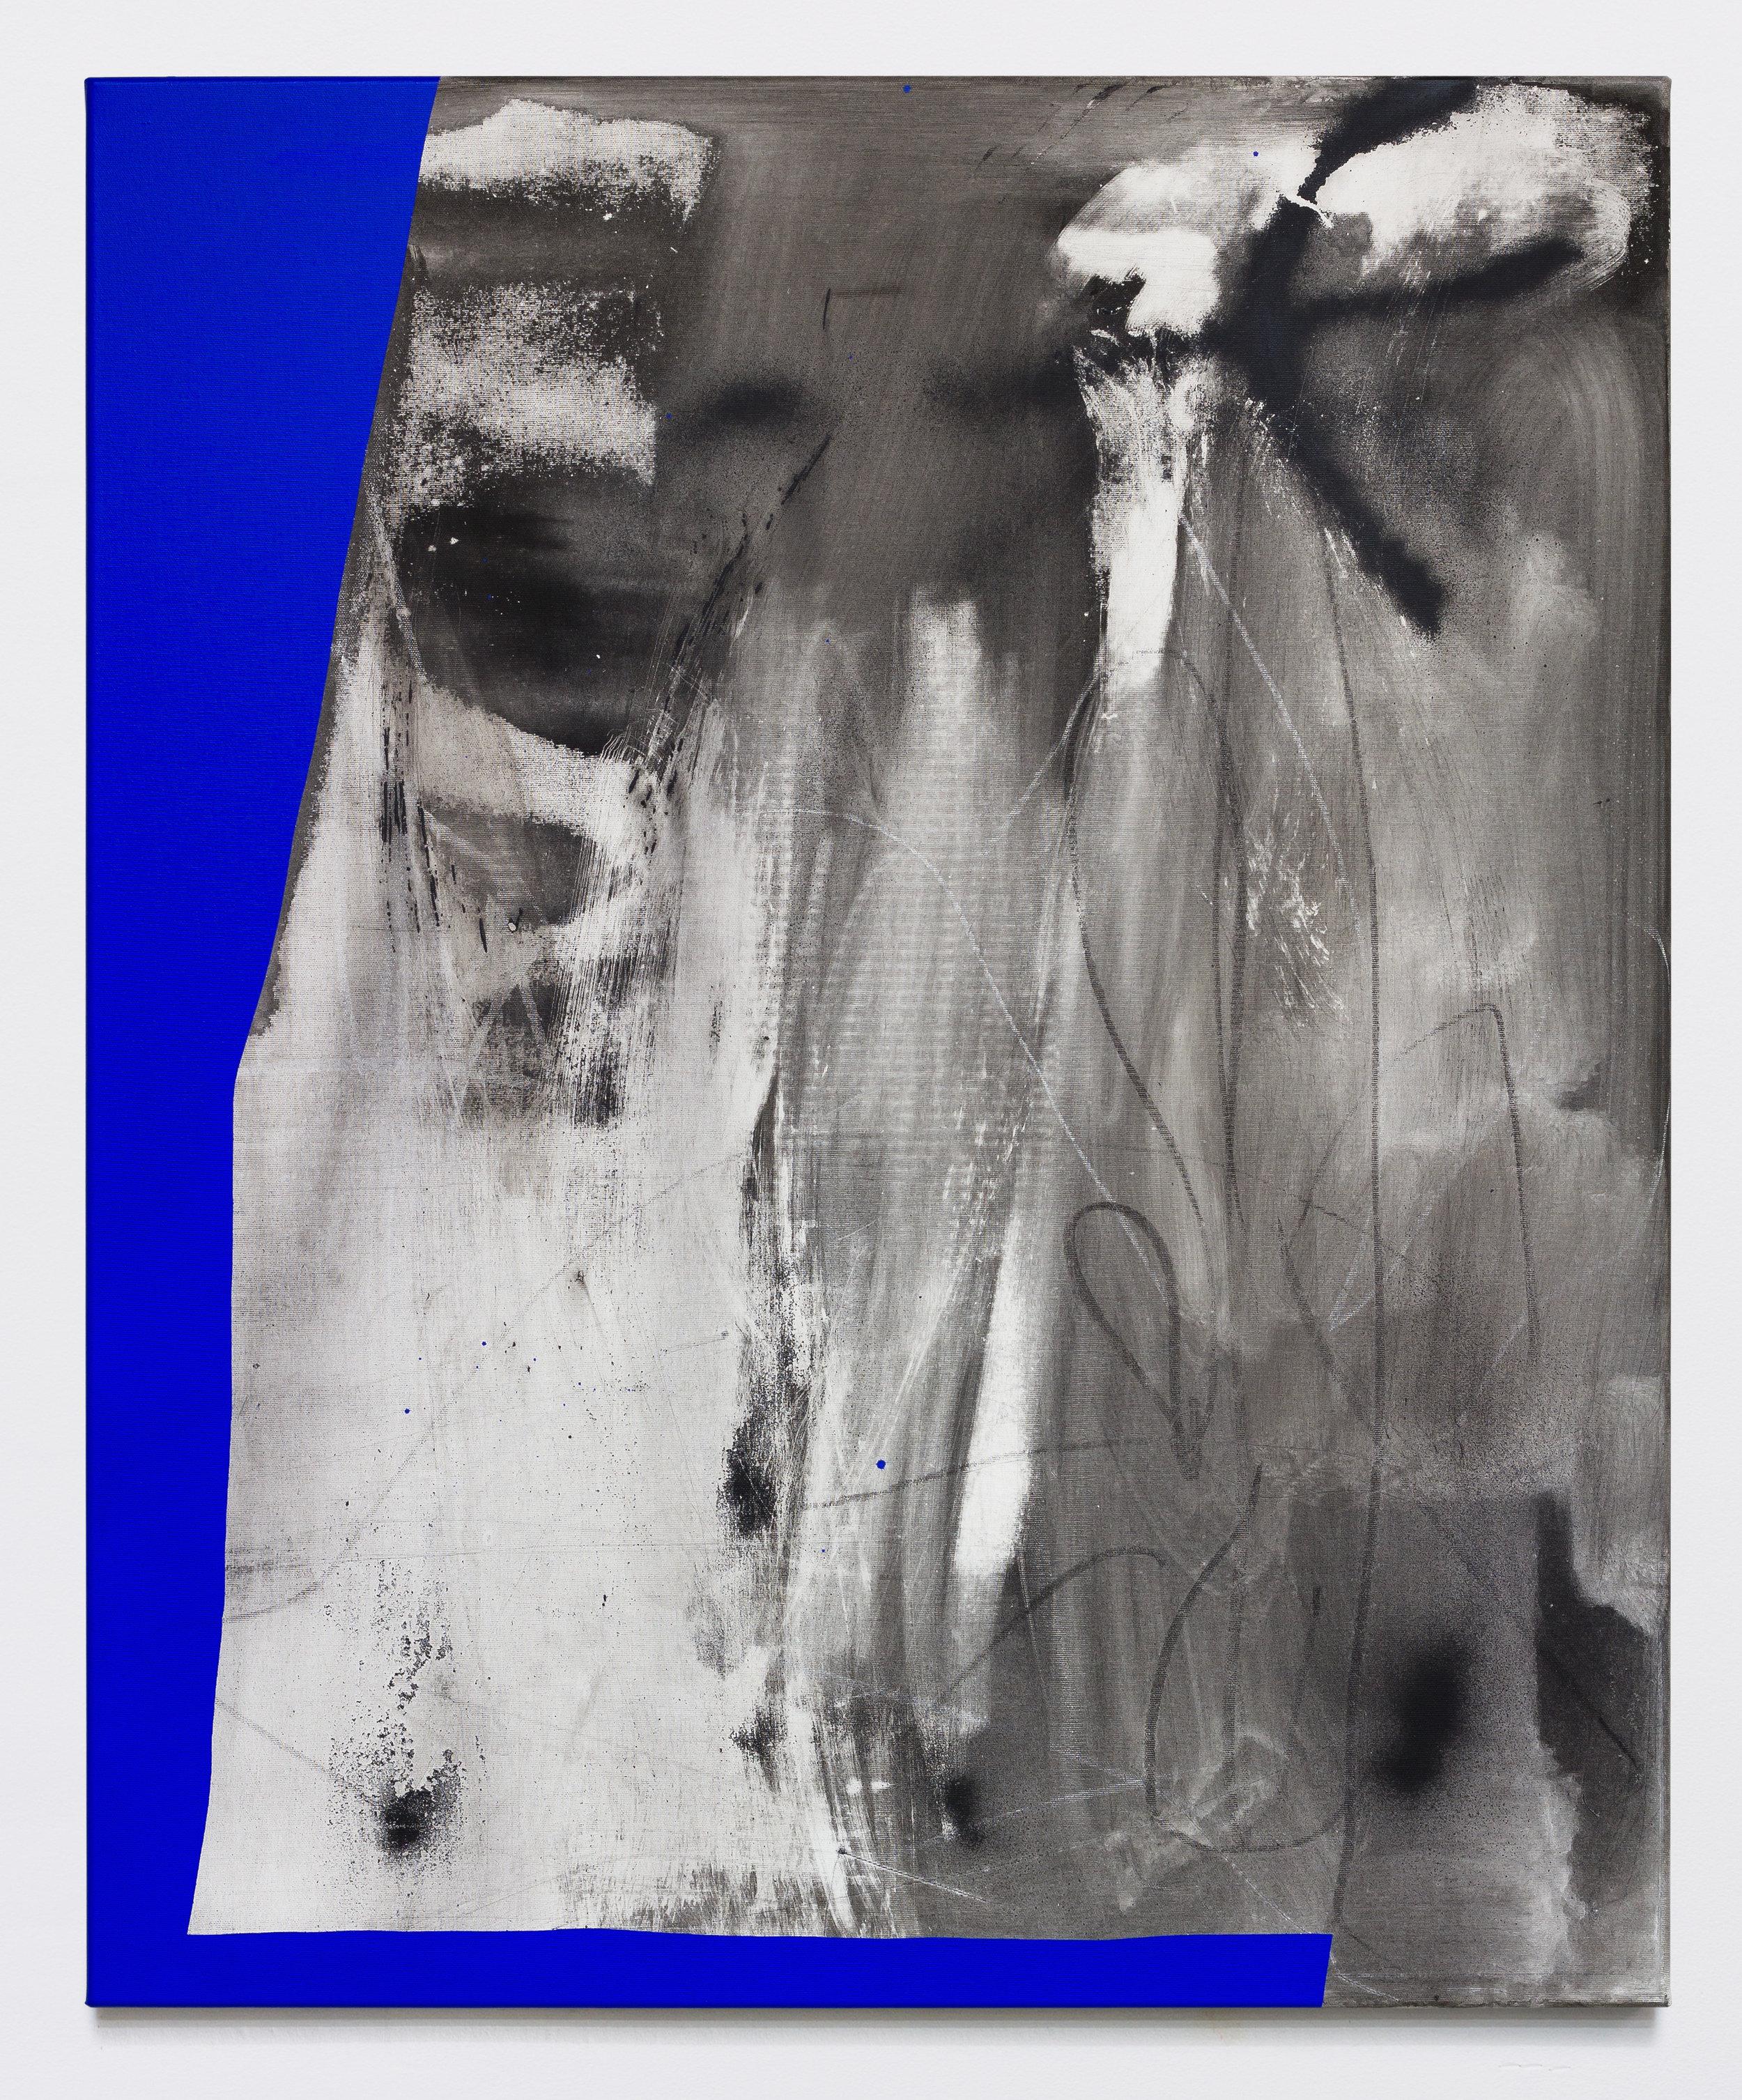 White Tinnitus | Acryl auf Leinwand | 90 x 110cm | 2019 | ©GALERIE ALBER